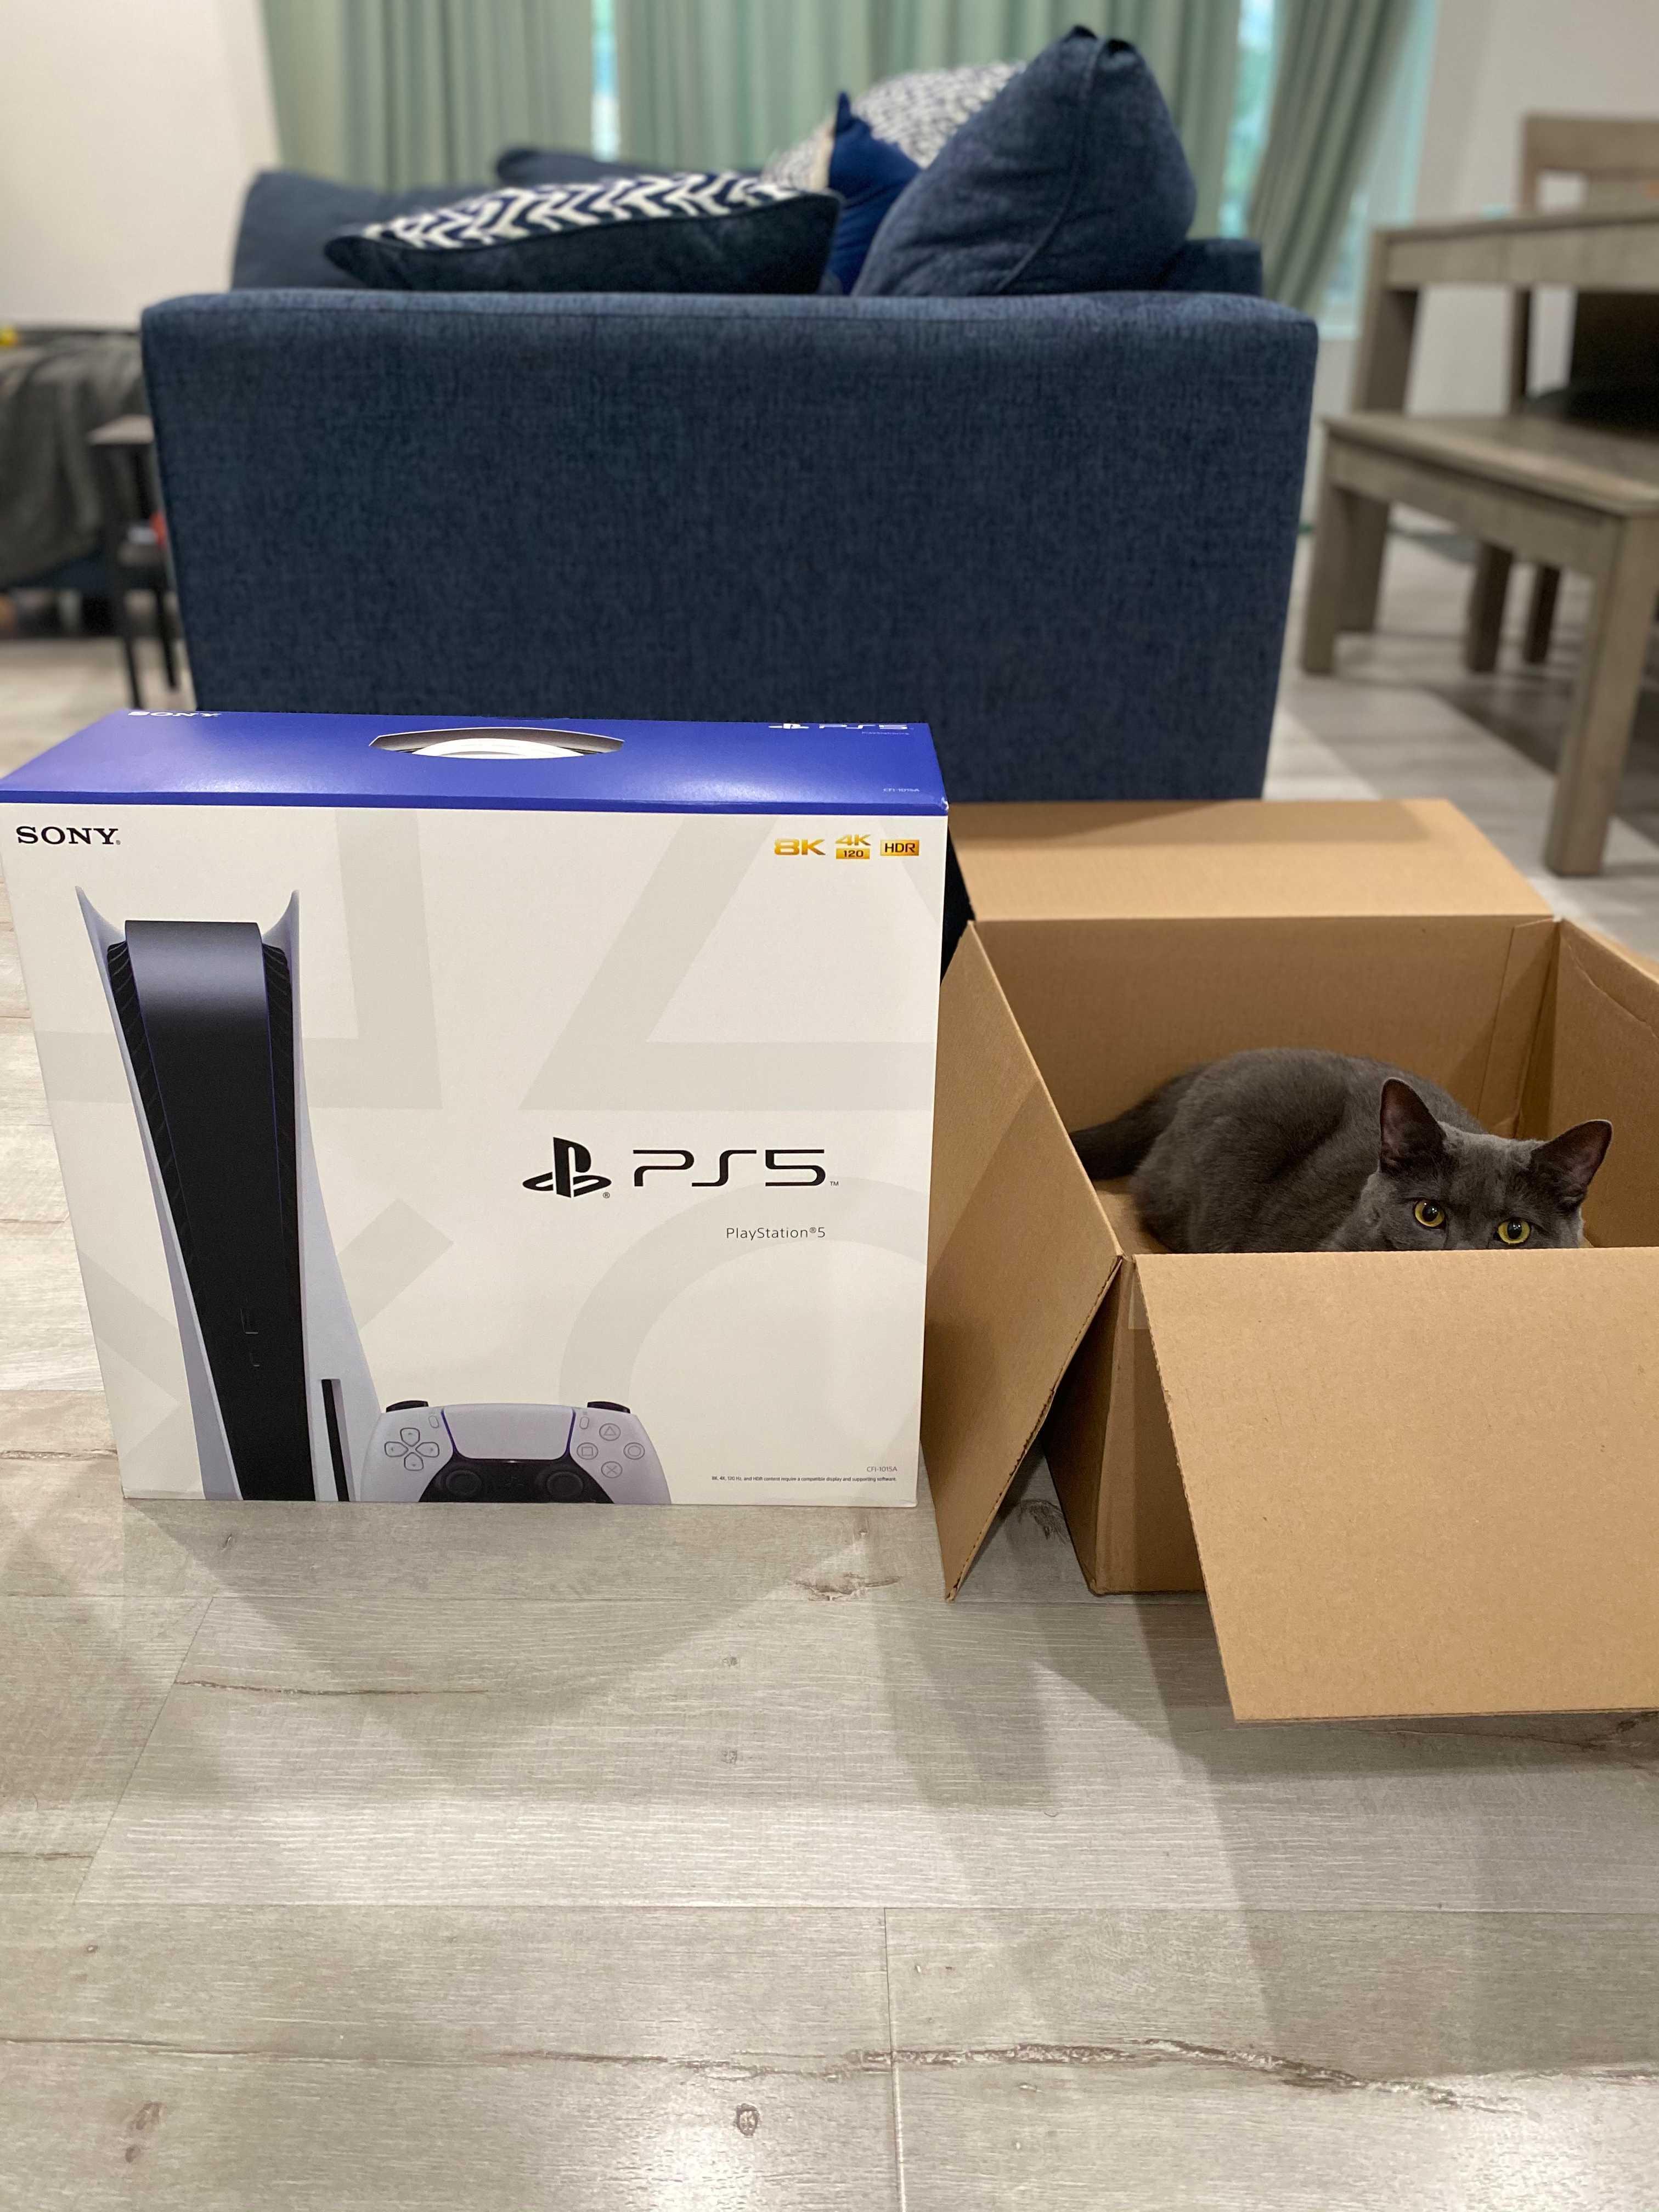 PS5手柄开箱视频 兼容XSX/PS4/笔记本电脑/谷歌手机